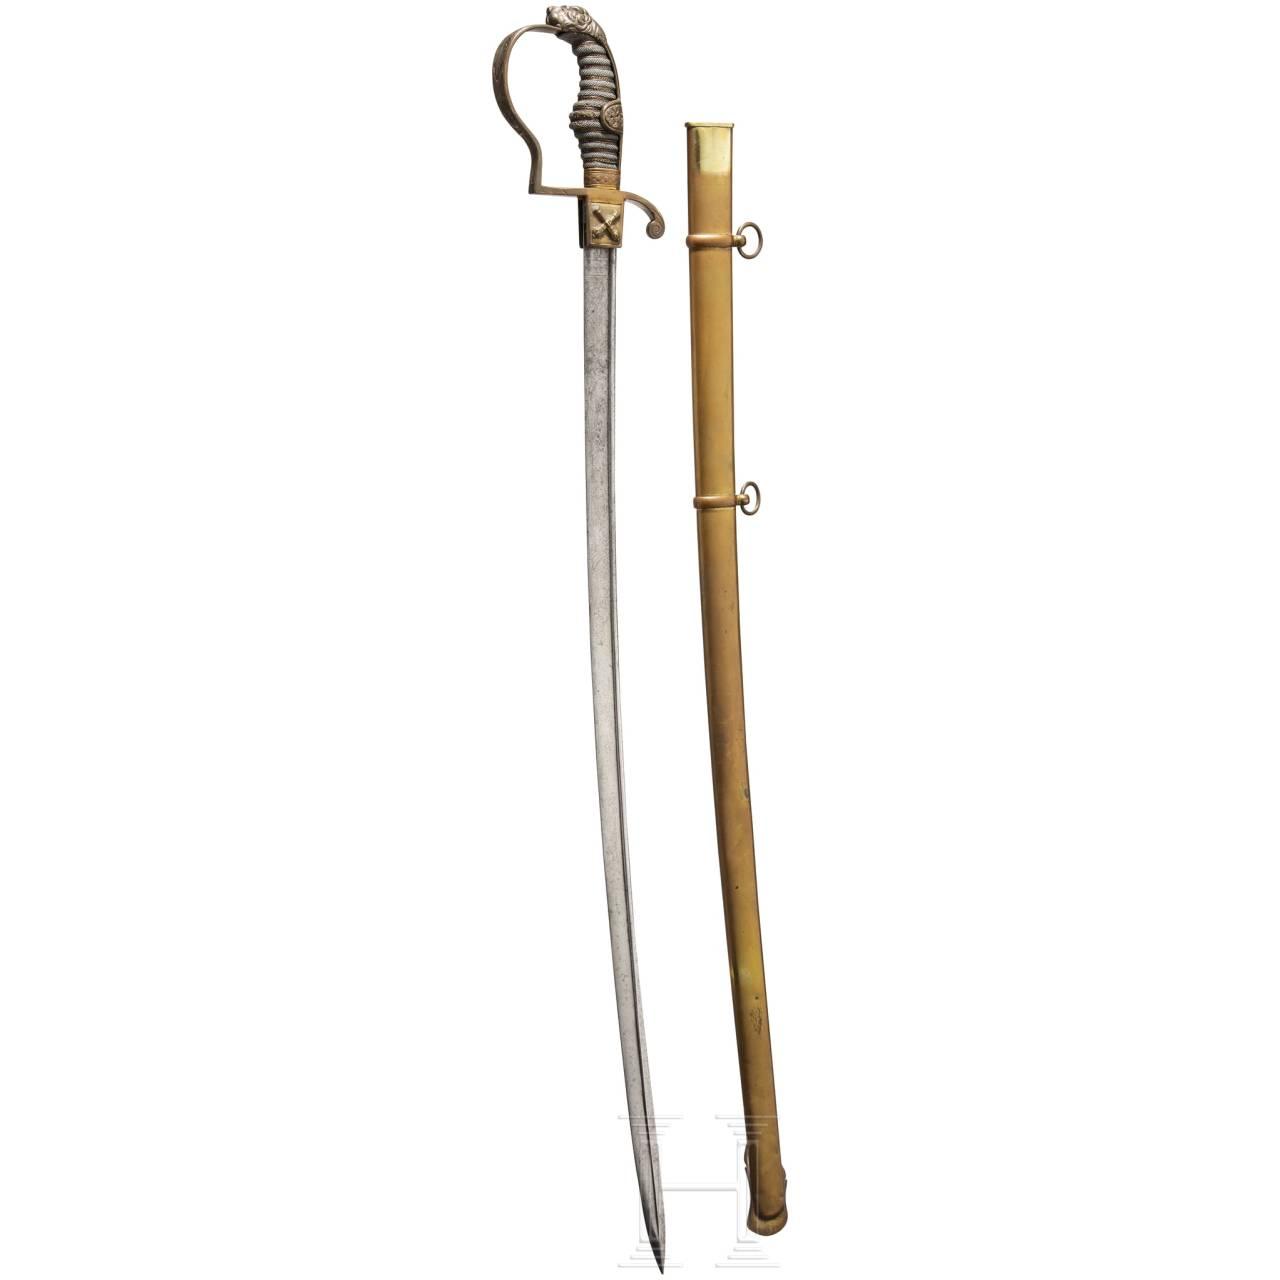 A sabre for officers of the Hamburg militia, ca. 1840